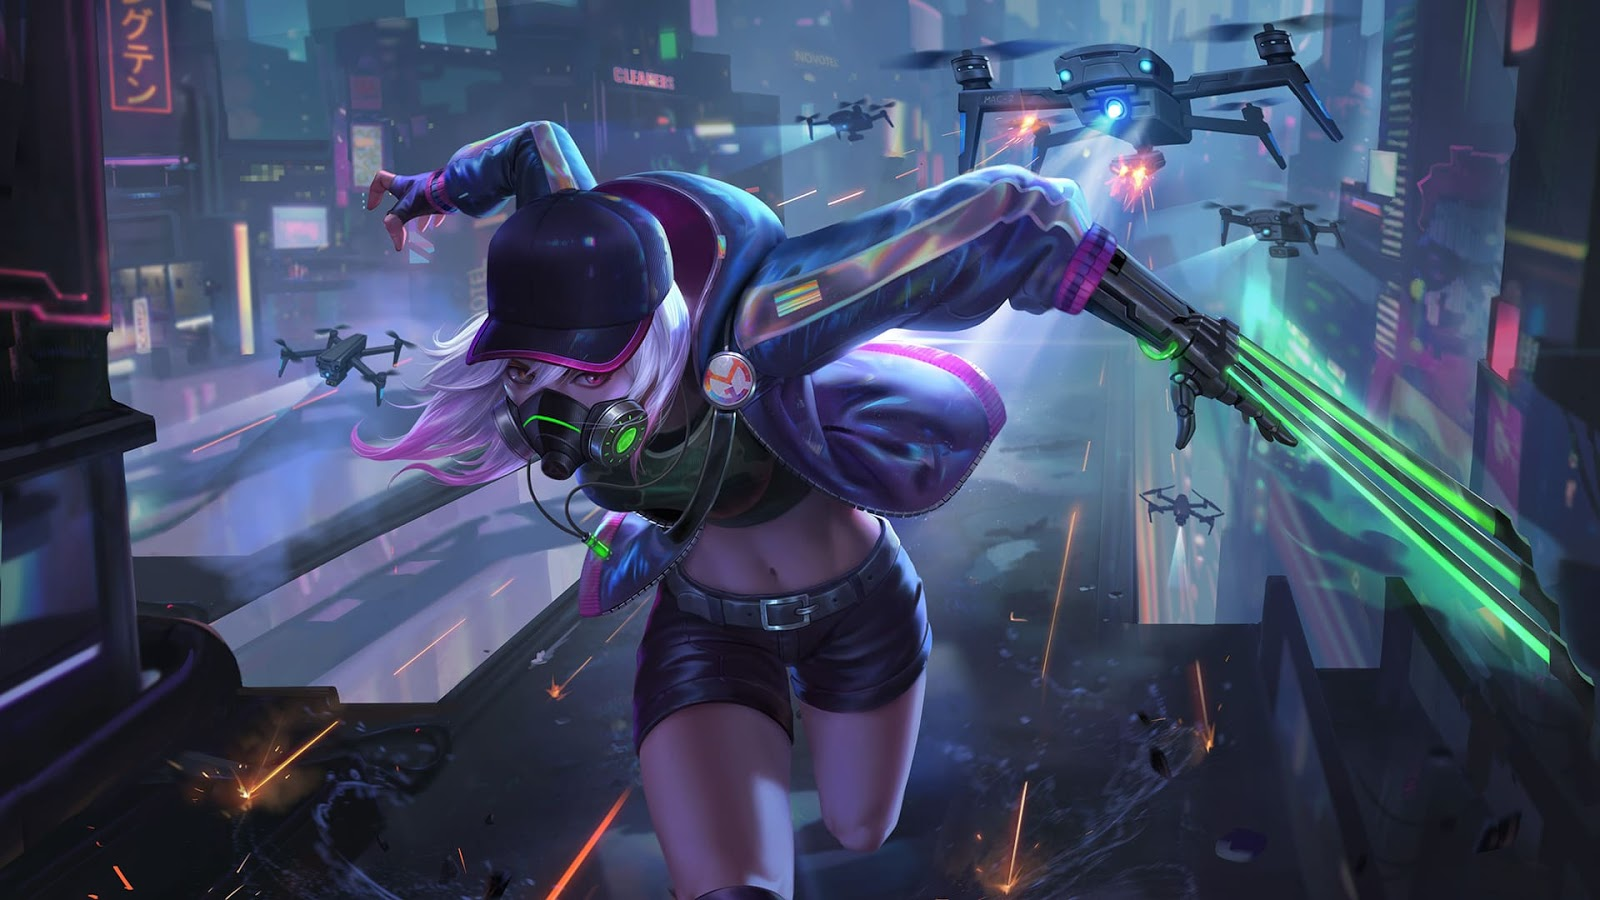 Wallpaper Natalia Cyber Spectre Skin Mobile Legends HD for PC